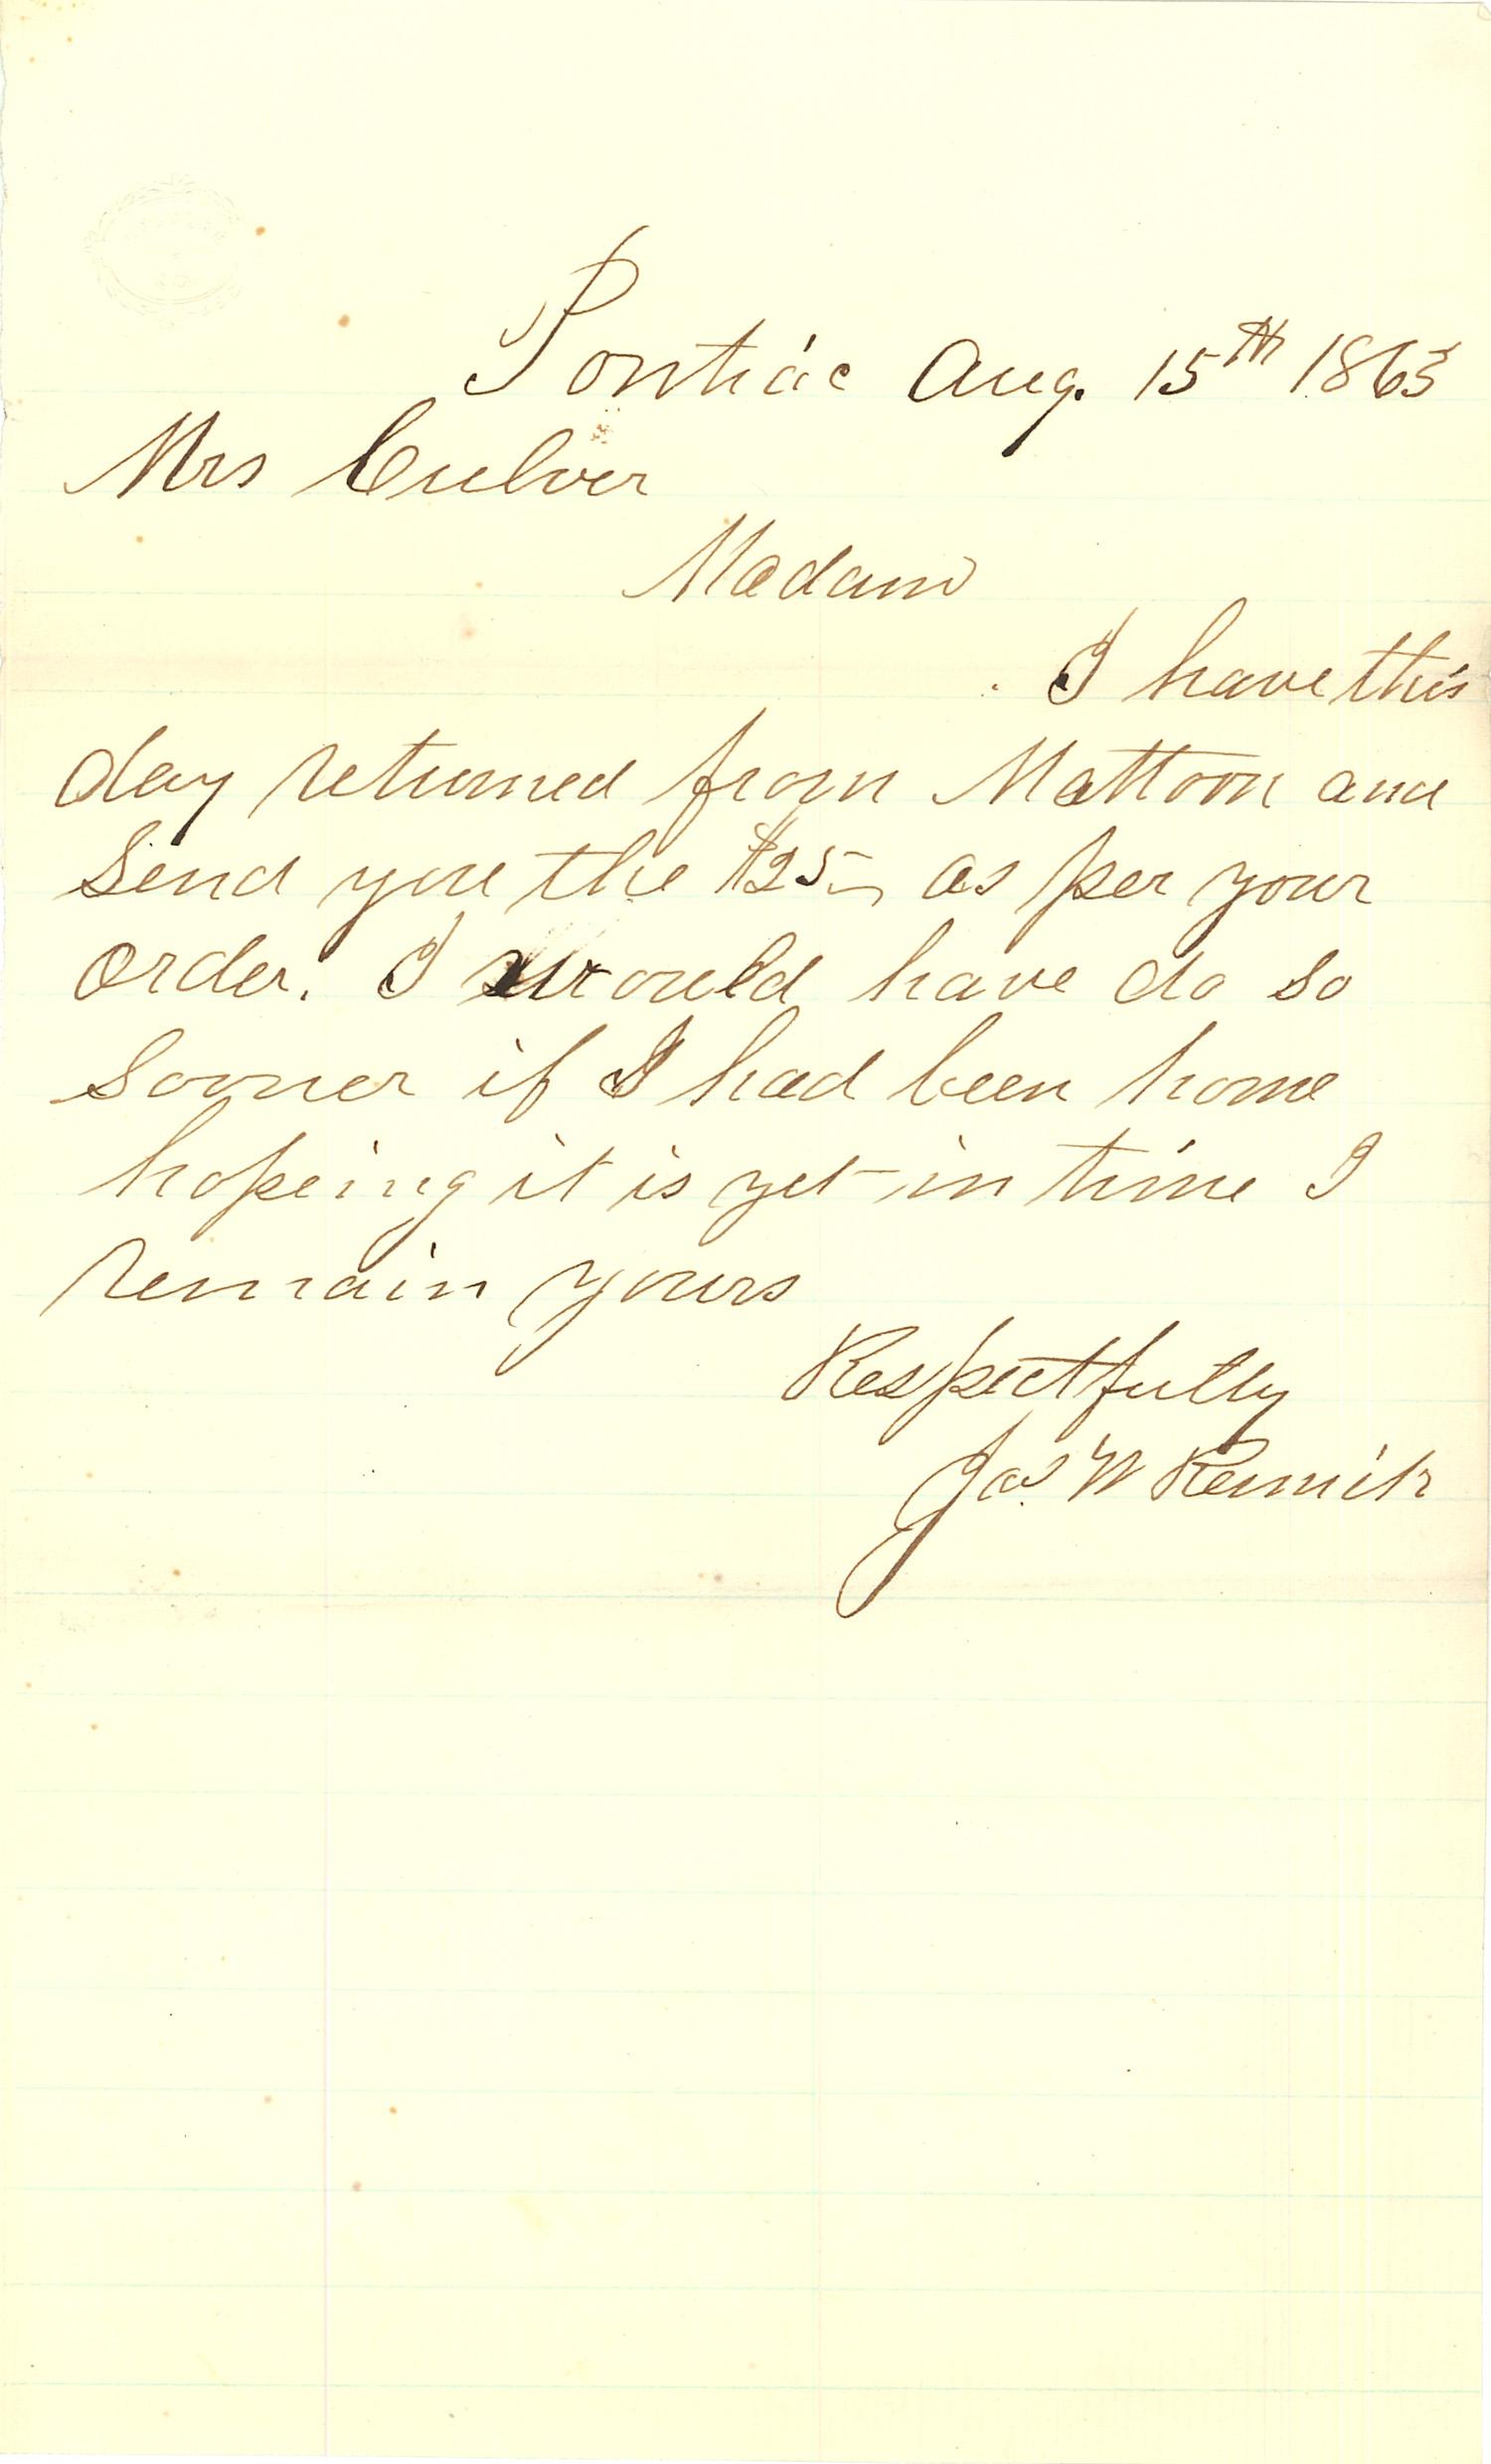 Joseph Culver Letter, August 15, 1863, Page 1